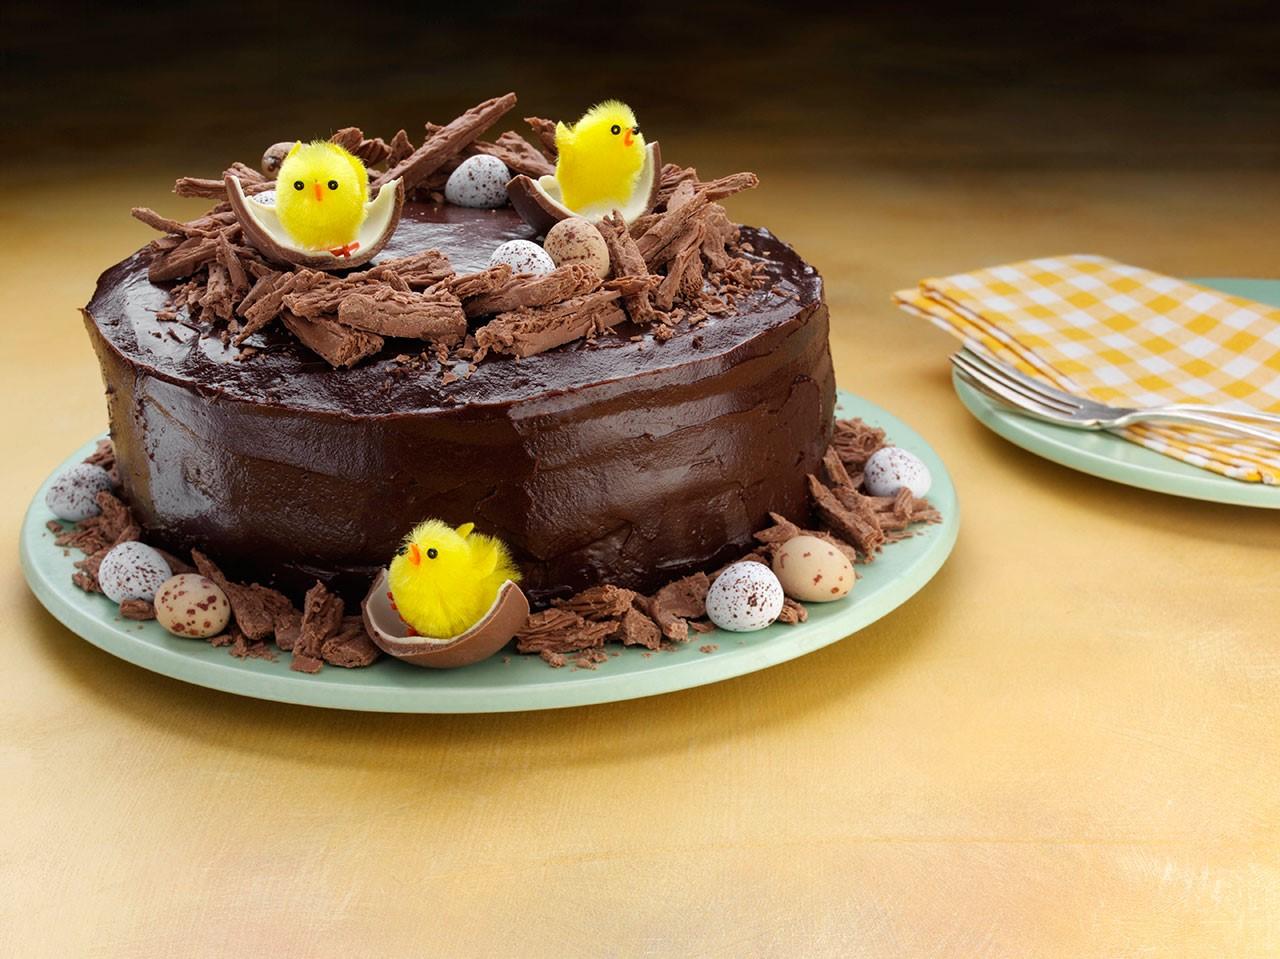 Gâteau festif qui impressionnera vos invités.